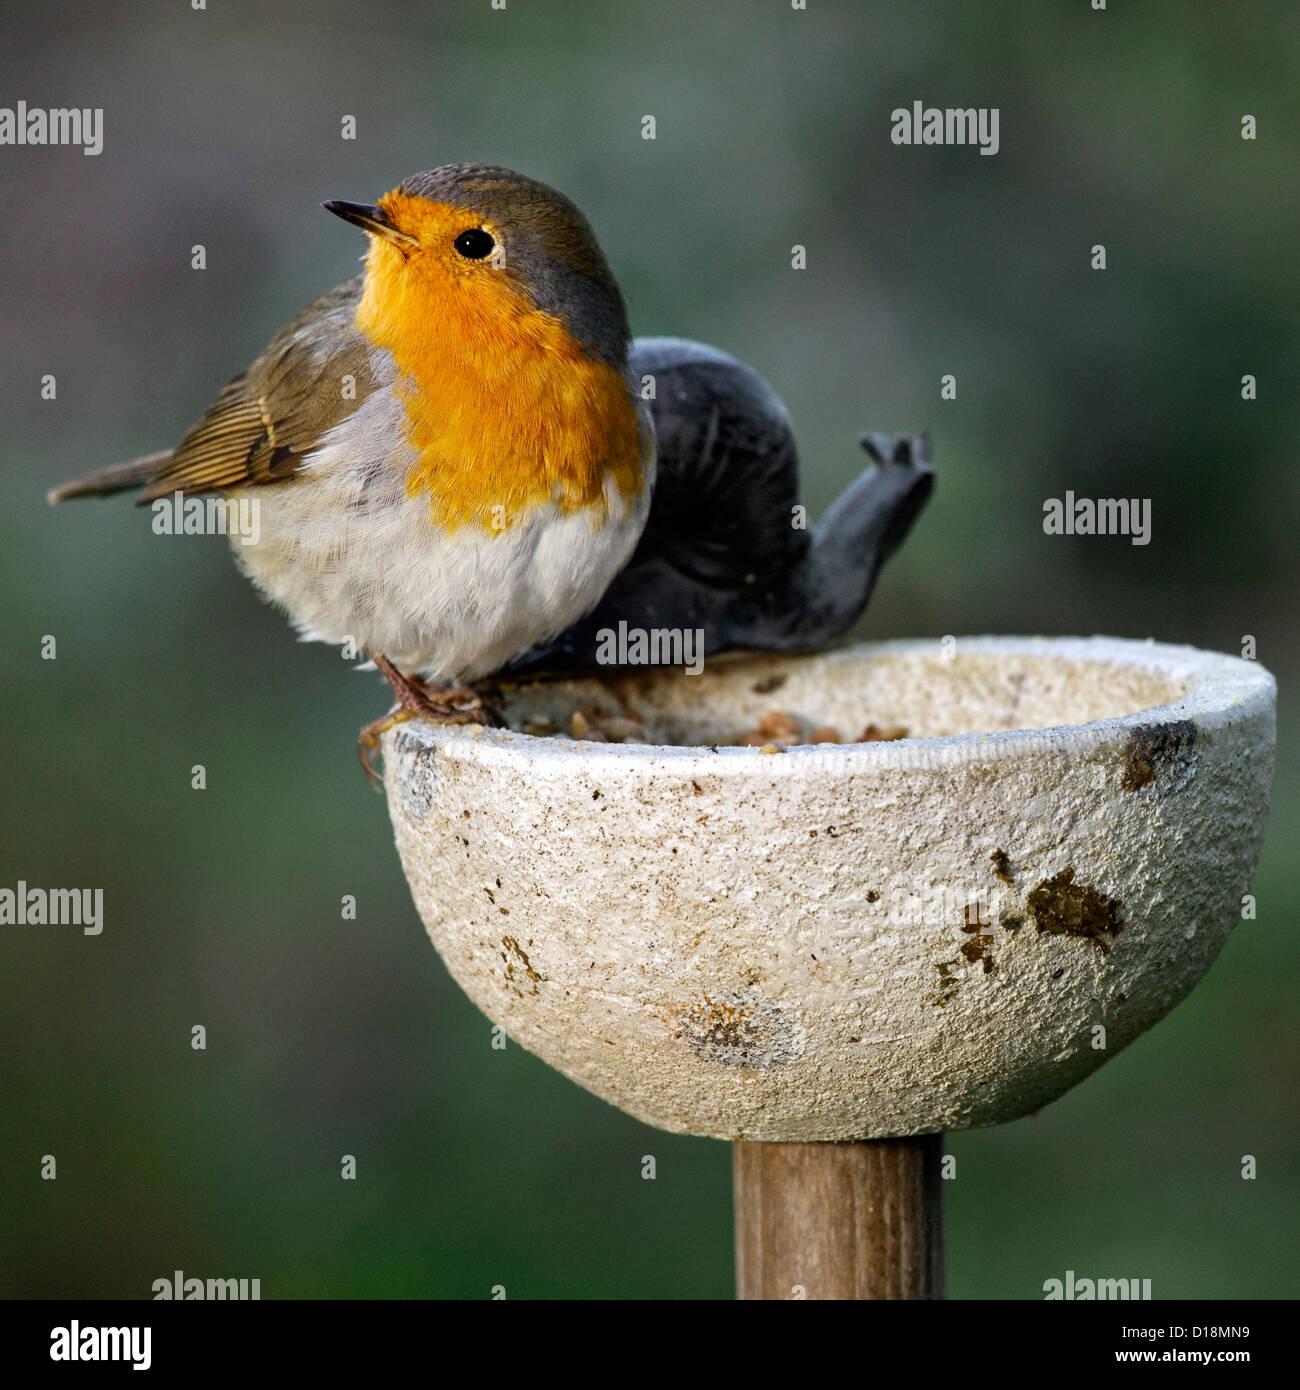 European Robin (Erithacus rubecula) on birdfeeder in garden in winter - Stock Image